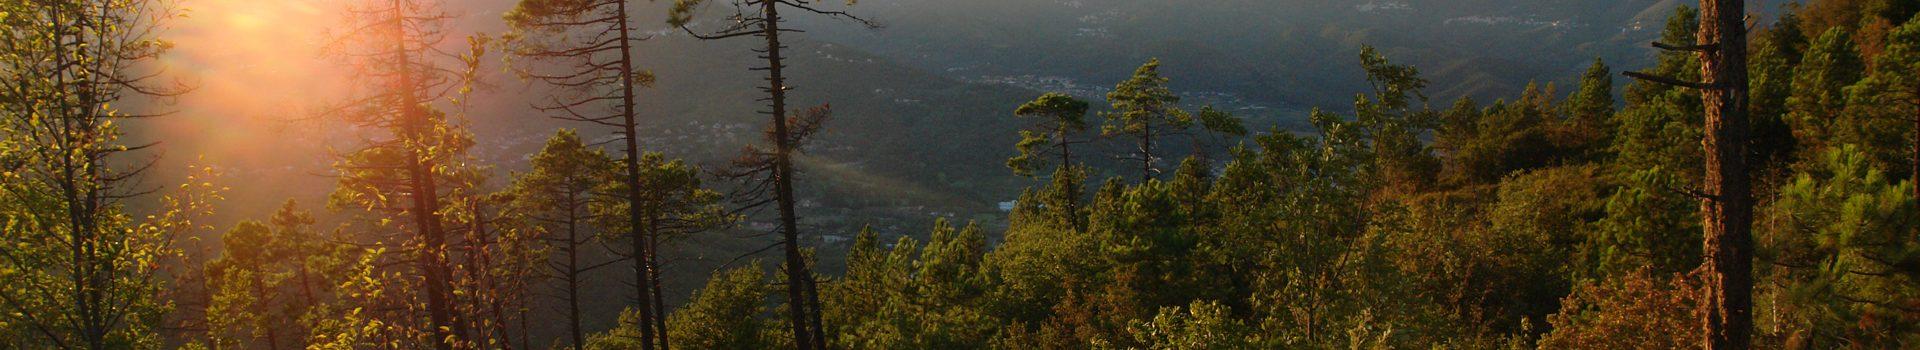 Reisen in Ligurien